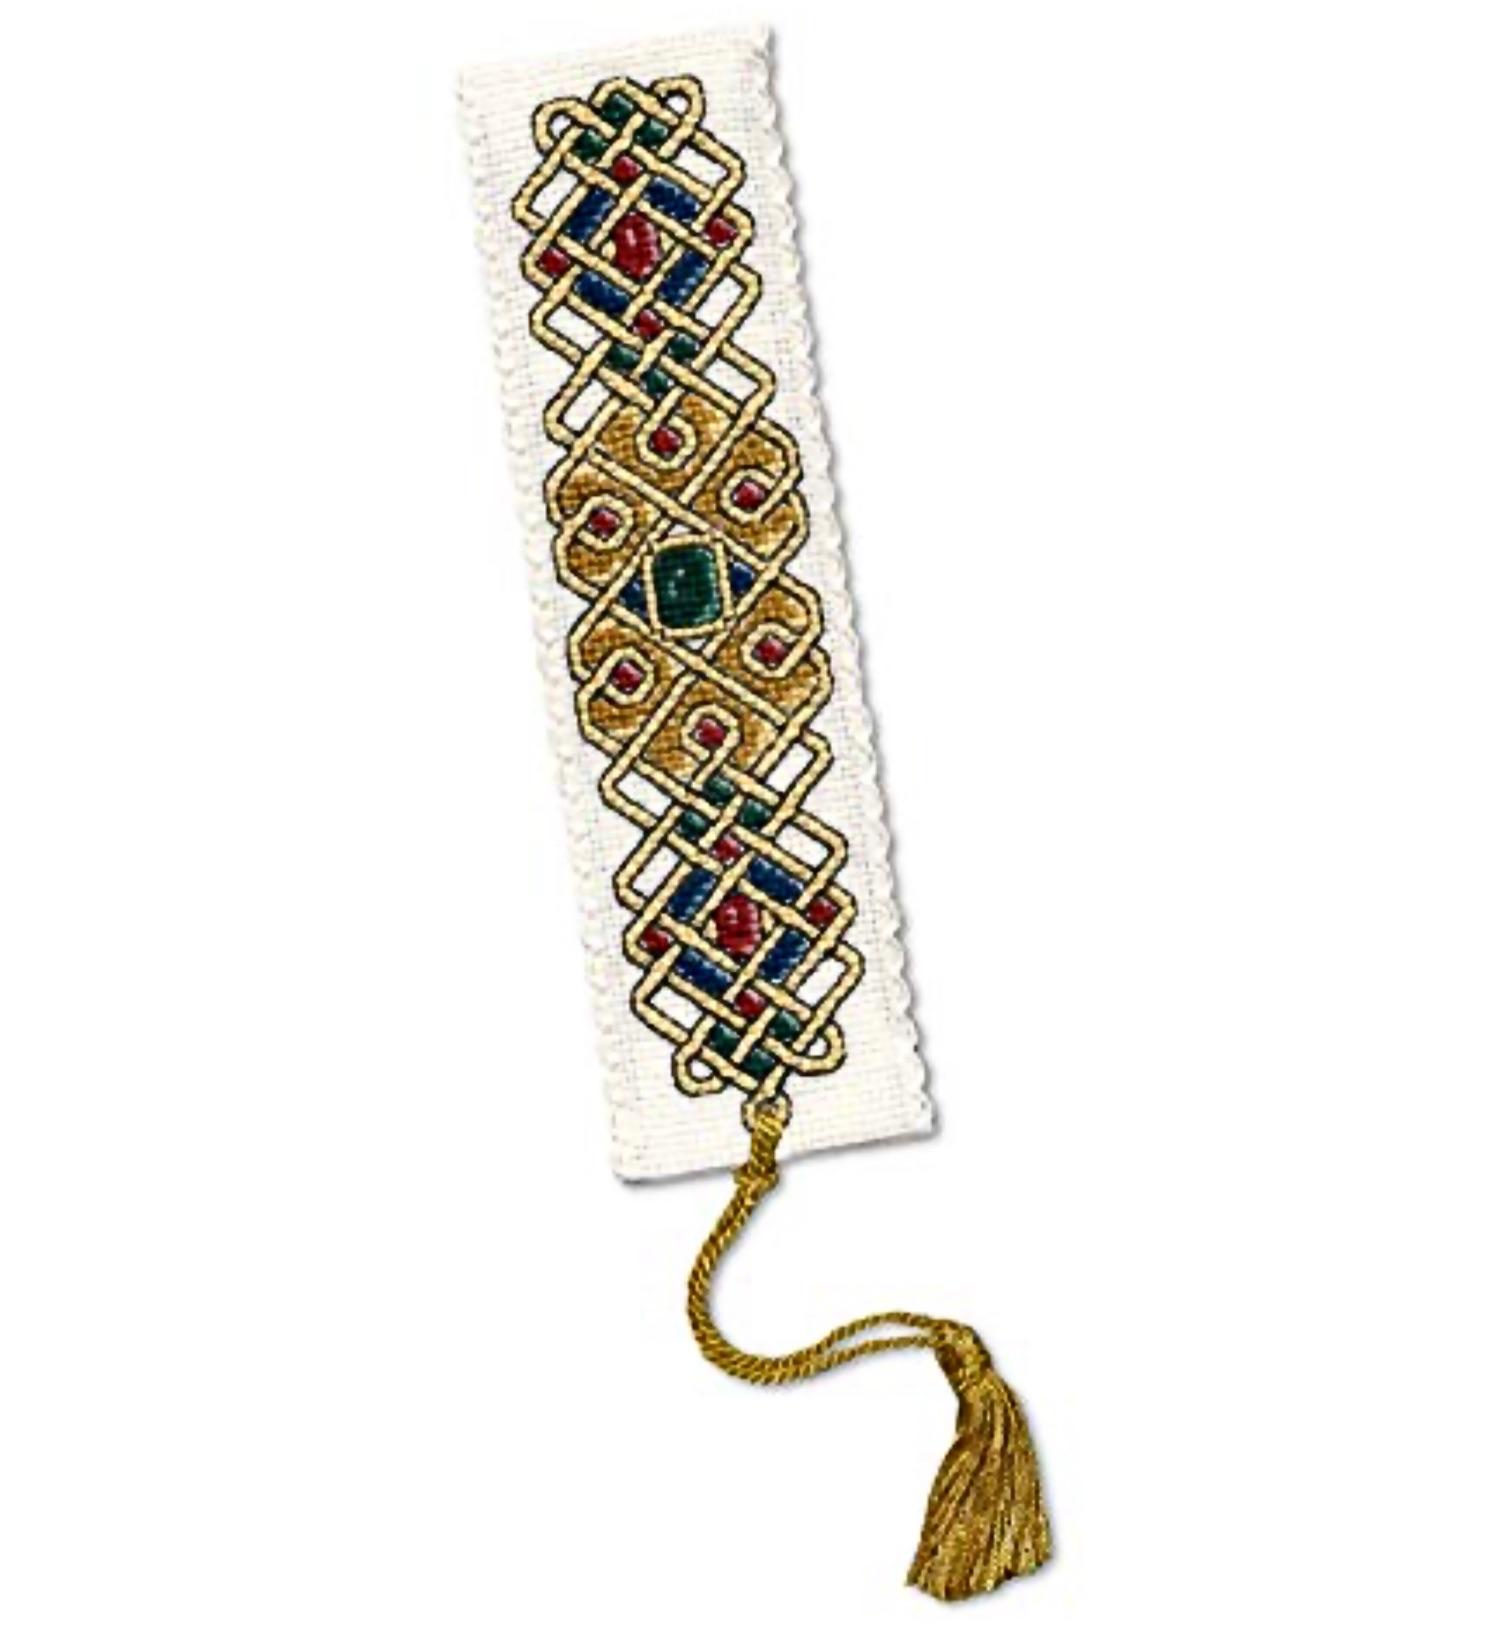 BOOKMARK Celtic Jewel. Cross Stitch Kit by Textile Heritage